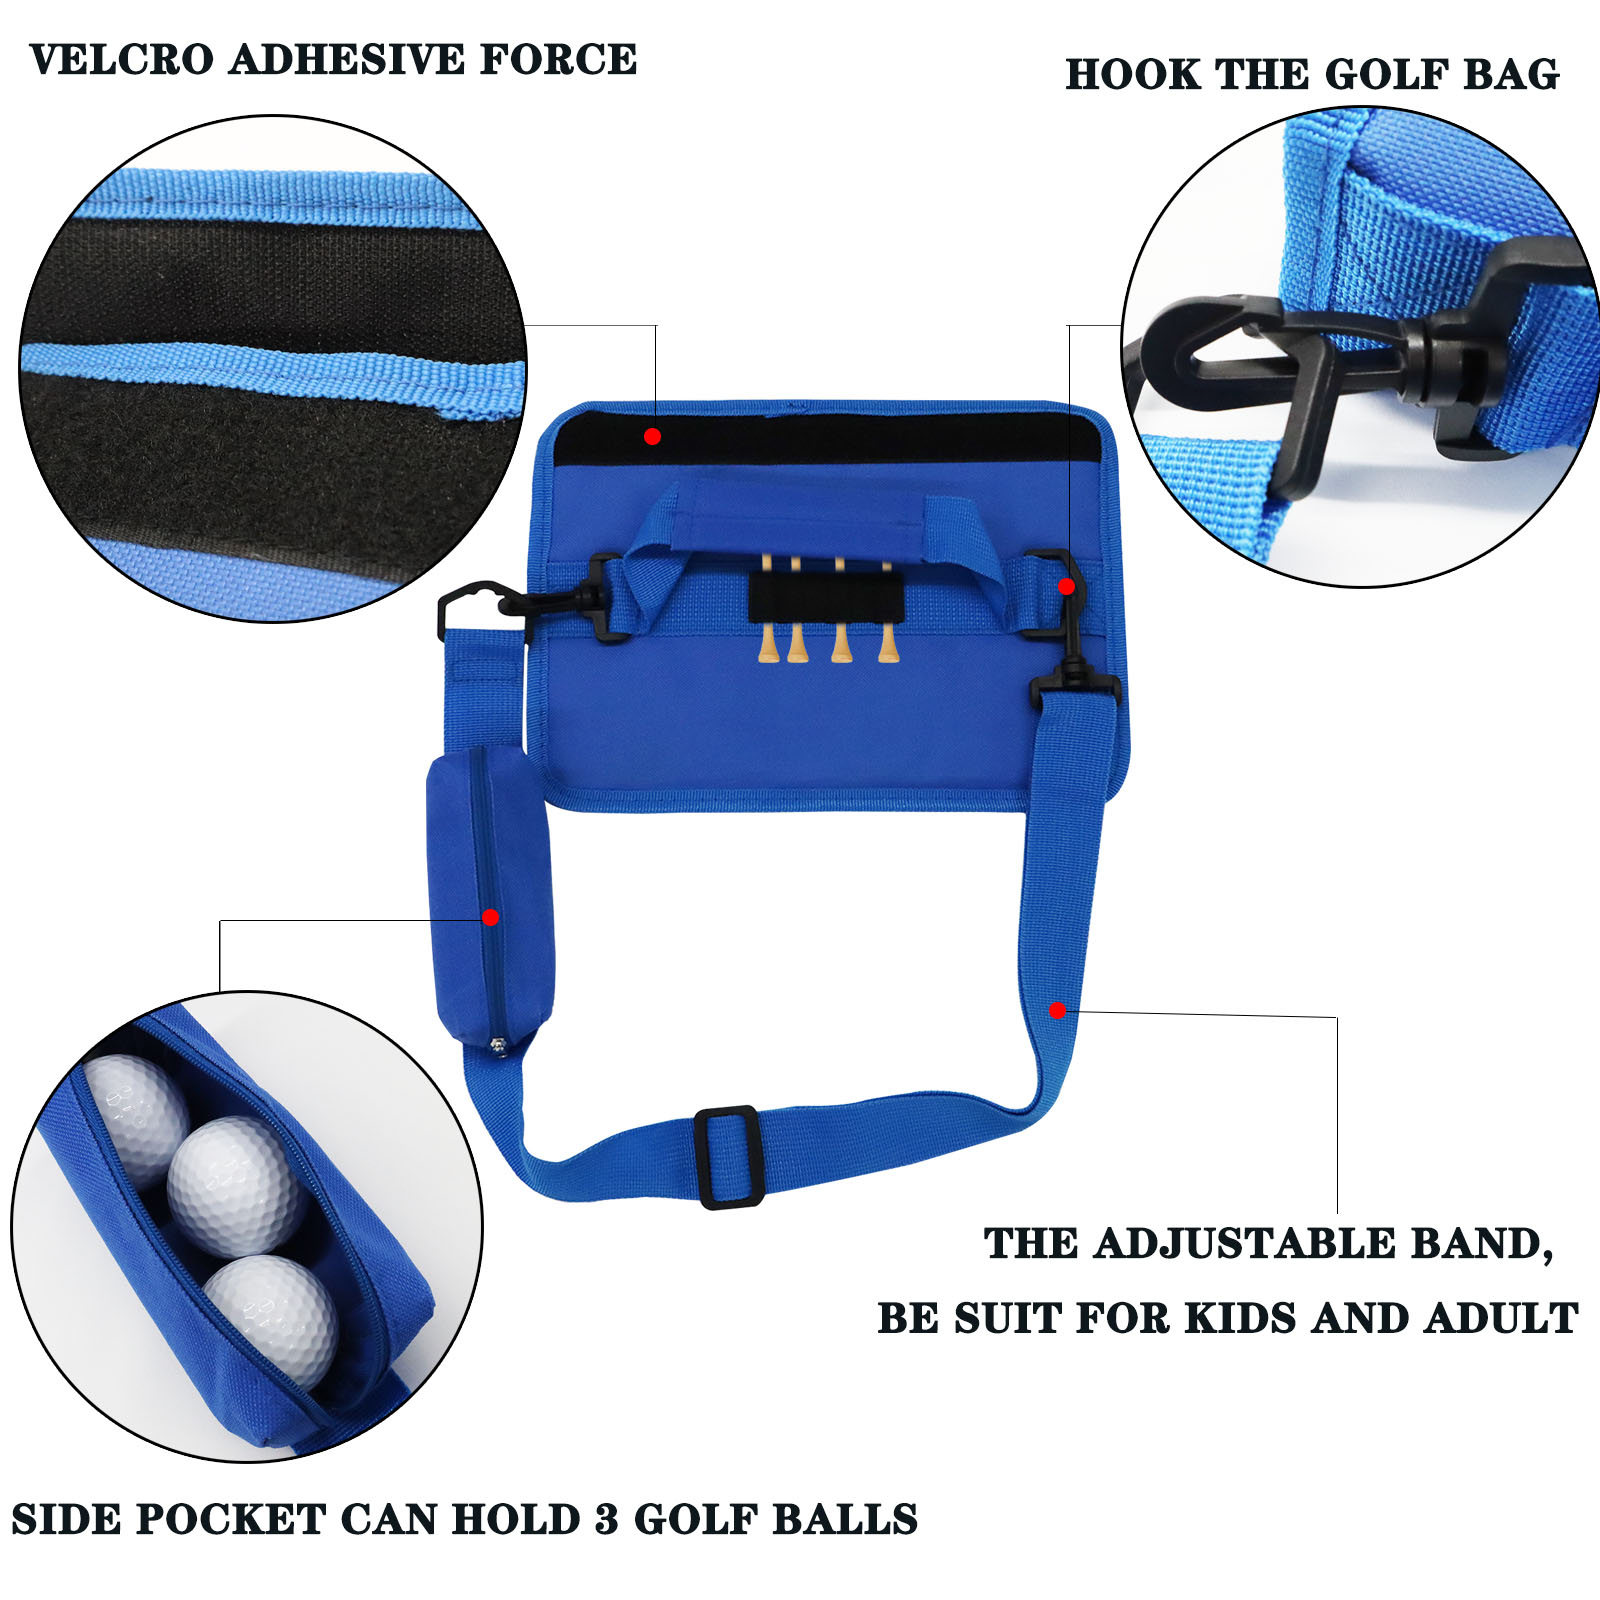 Hff96e170a45b414a8ba3f6d8c4babfabO Lightweight Mini Golf Club Bag Driving Range Carrier Course Training Case Black Blue Pink for Men Women Kids